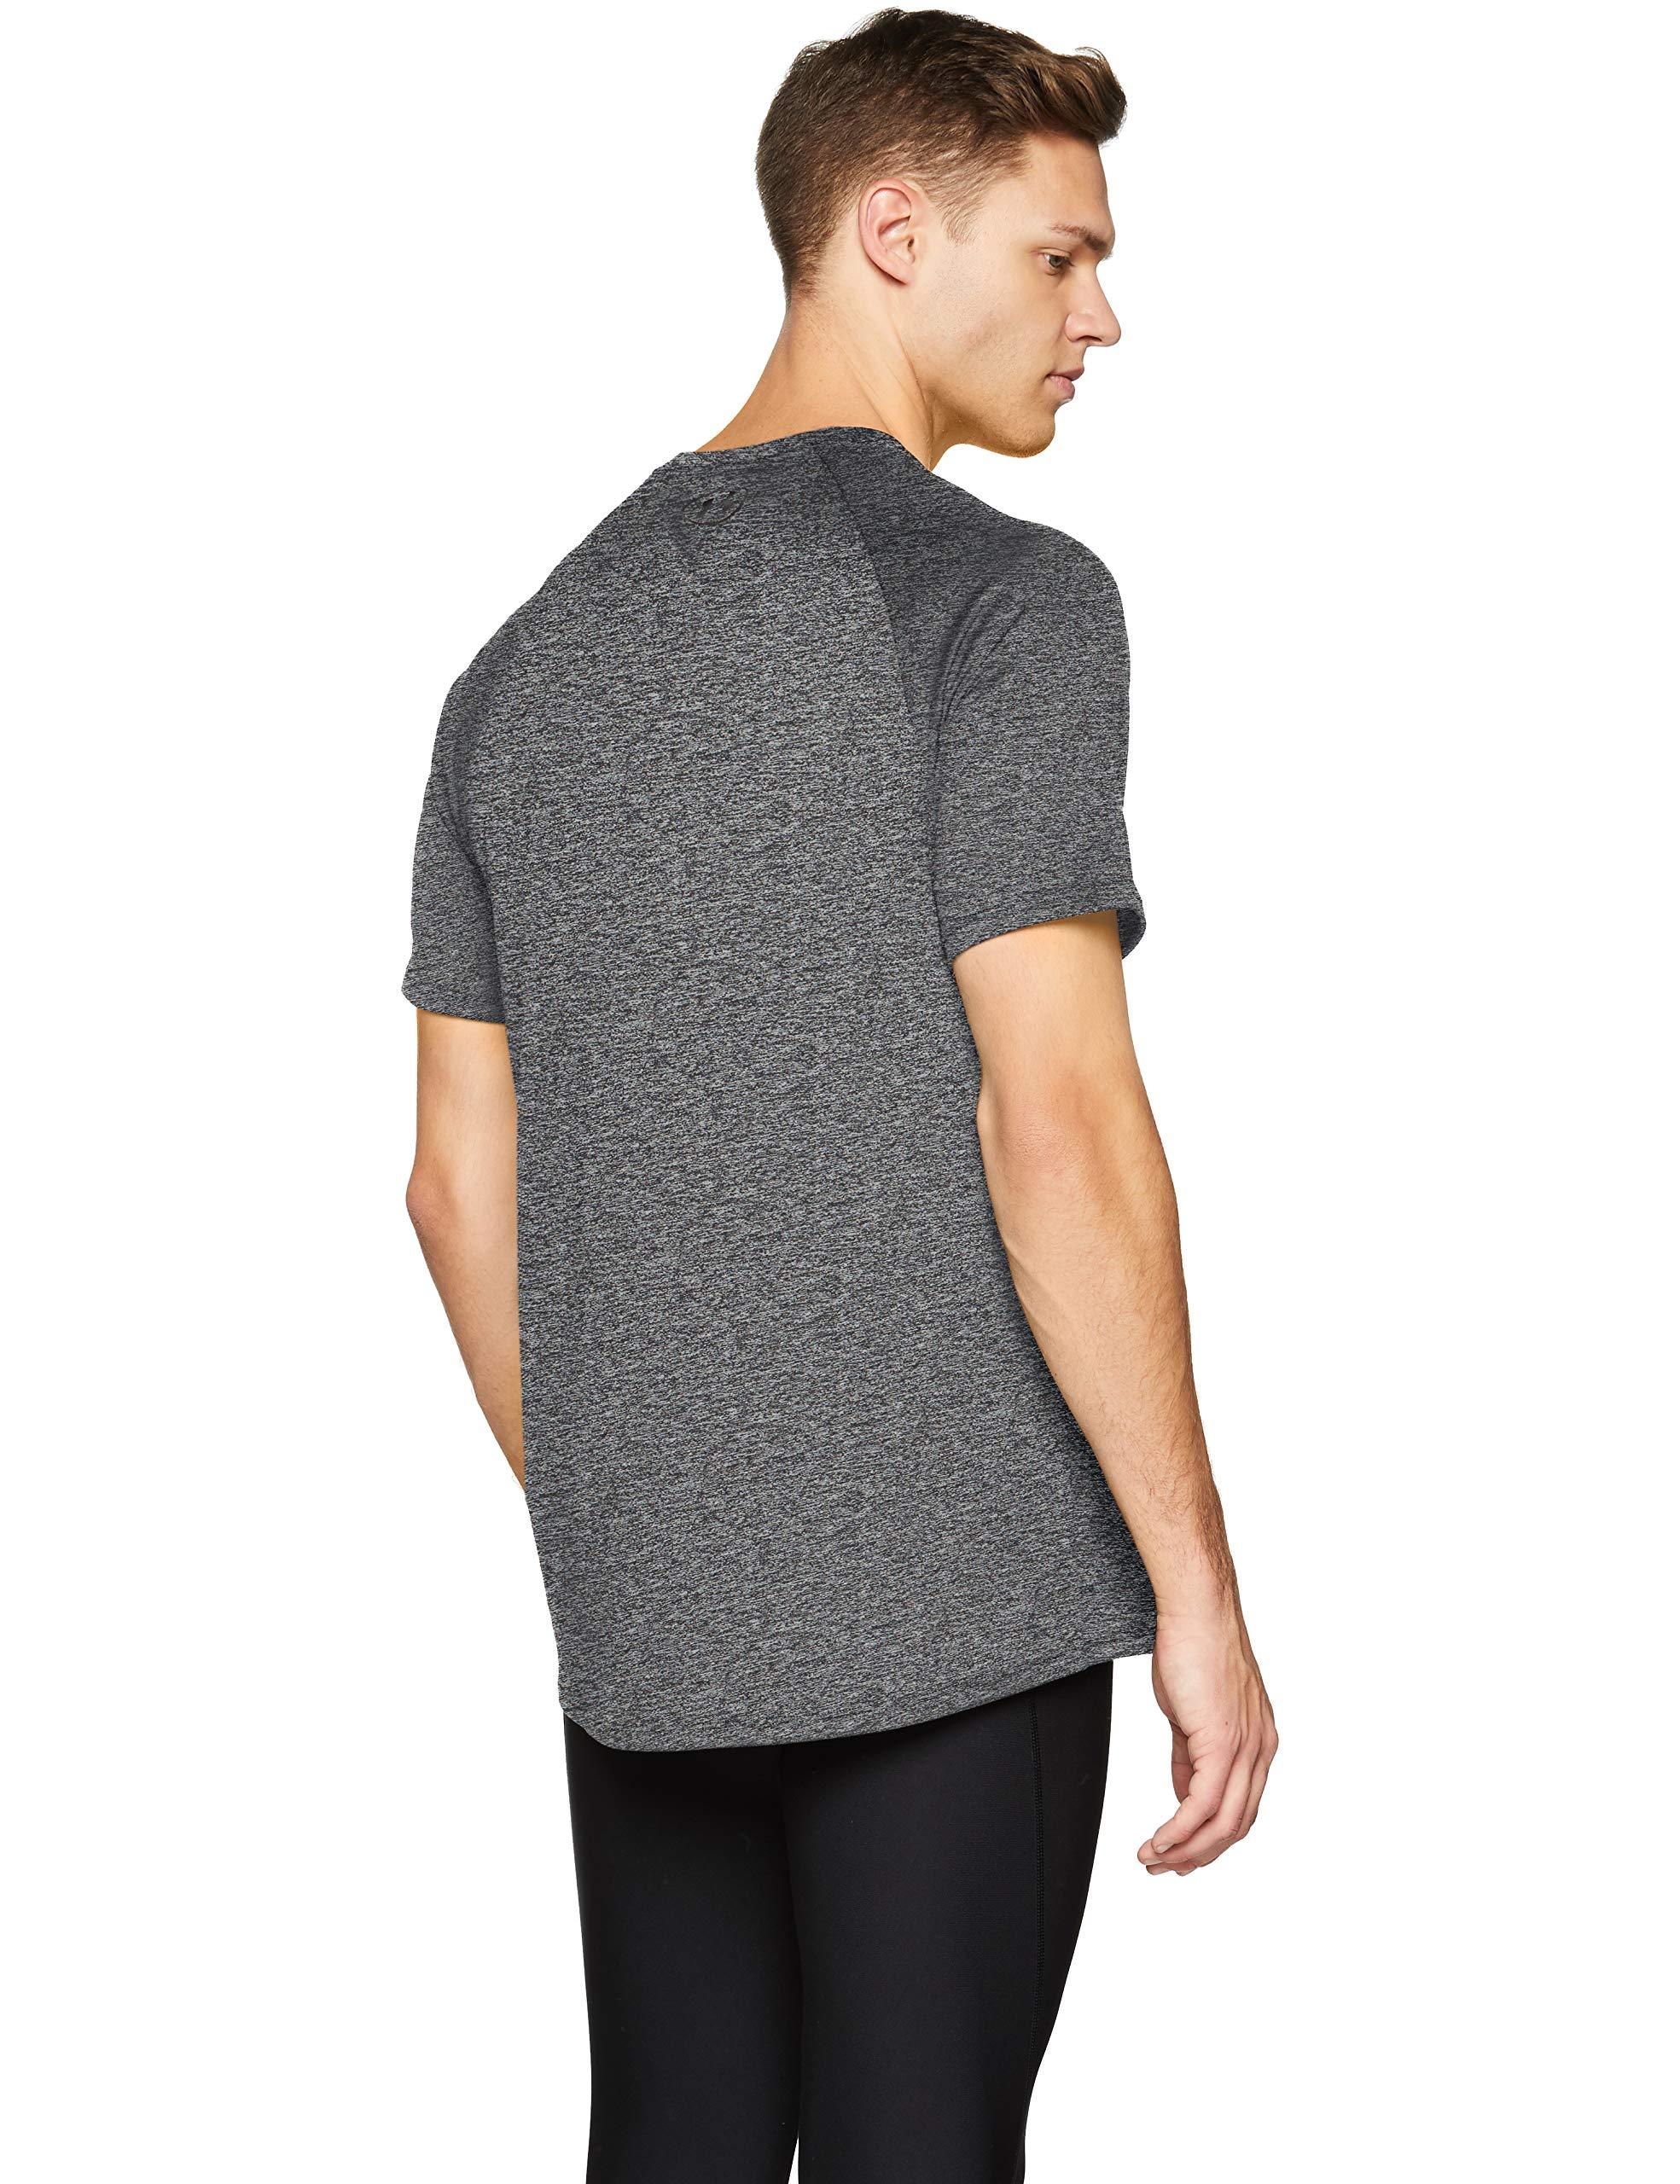 Under Armour Men's Tech 2.0 Short Sleeve T-Shirt, Black (002)/Black, 3X-Large by Under Armour (Image #2)